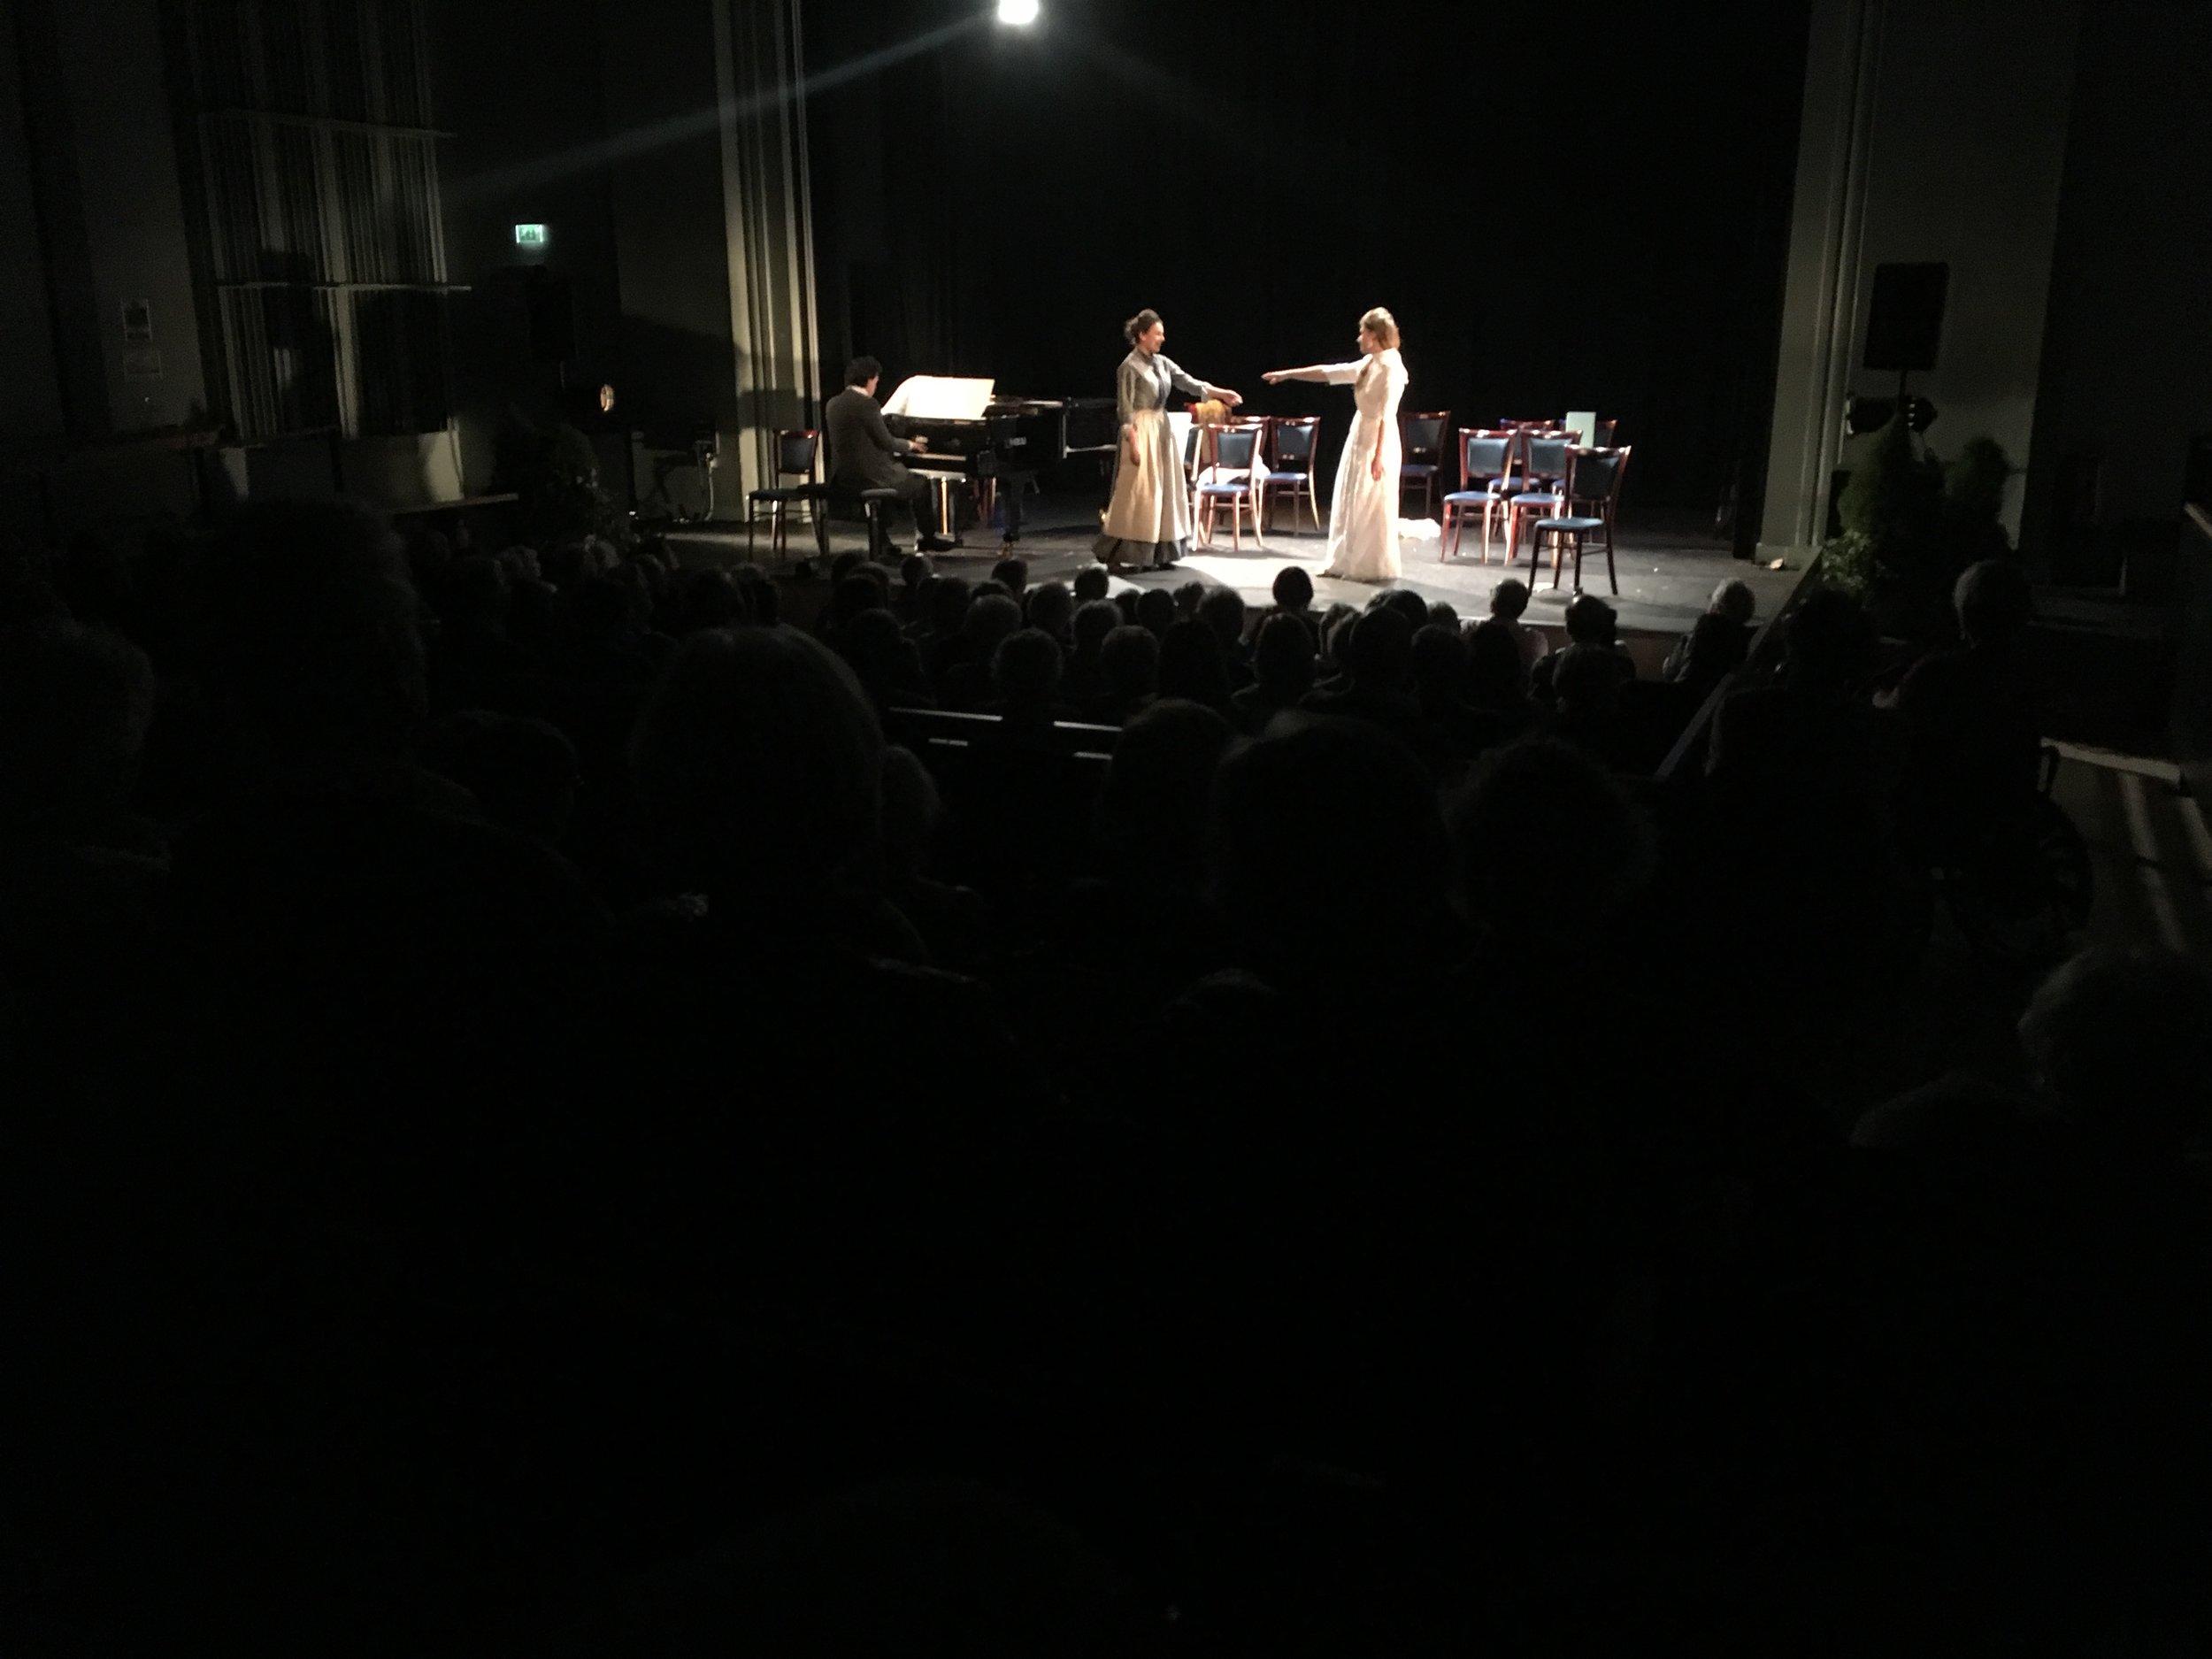 Soprano's Emma Walsh and Raphaela Papadakis